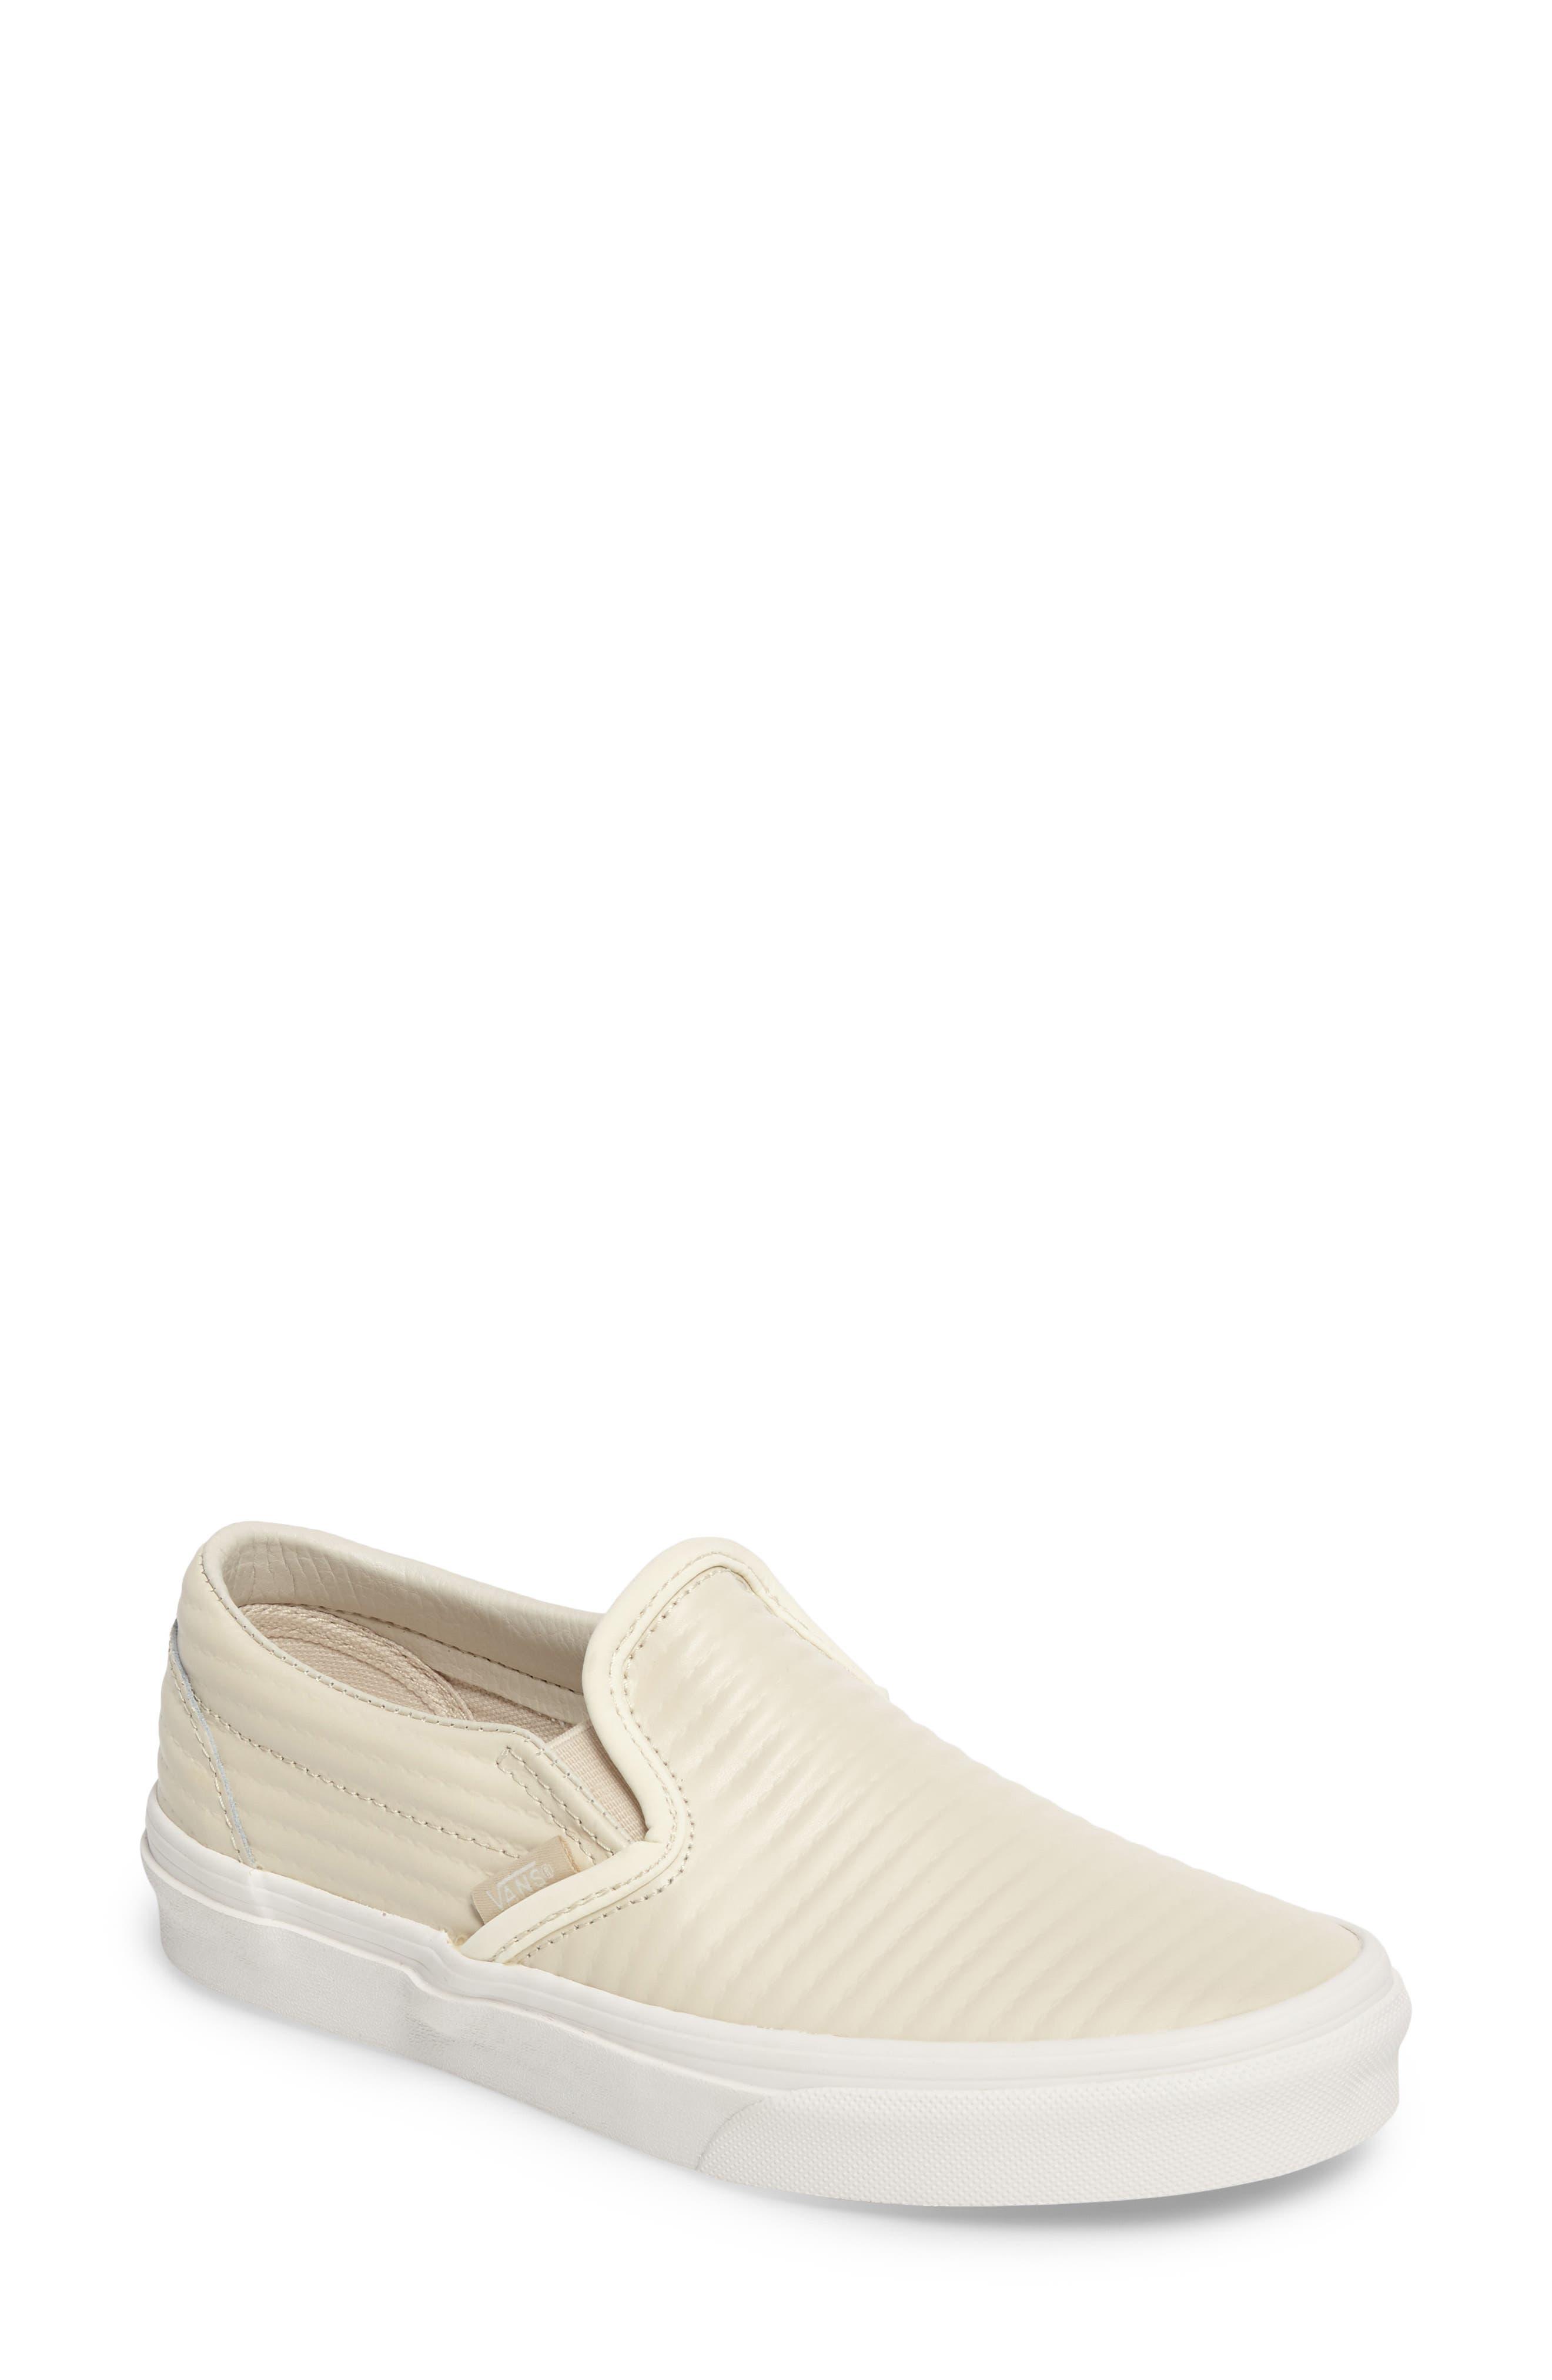 ,                             Classic Slip-On Sneaker,                             Main thumbnail 318, color,                             260